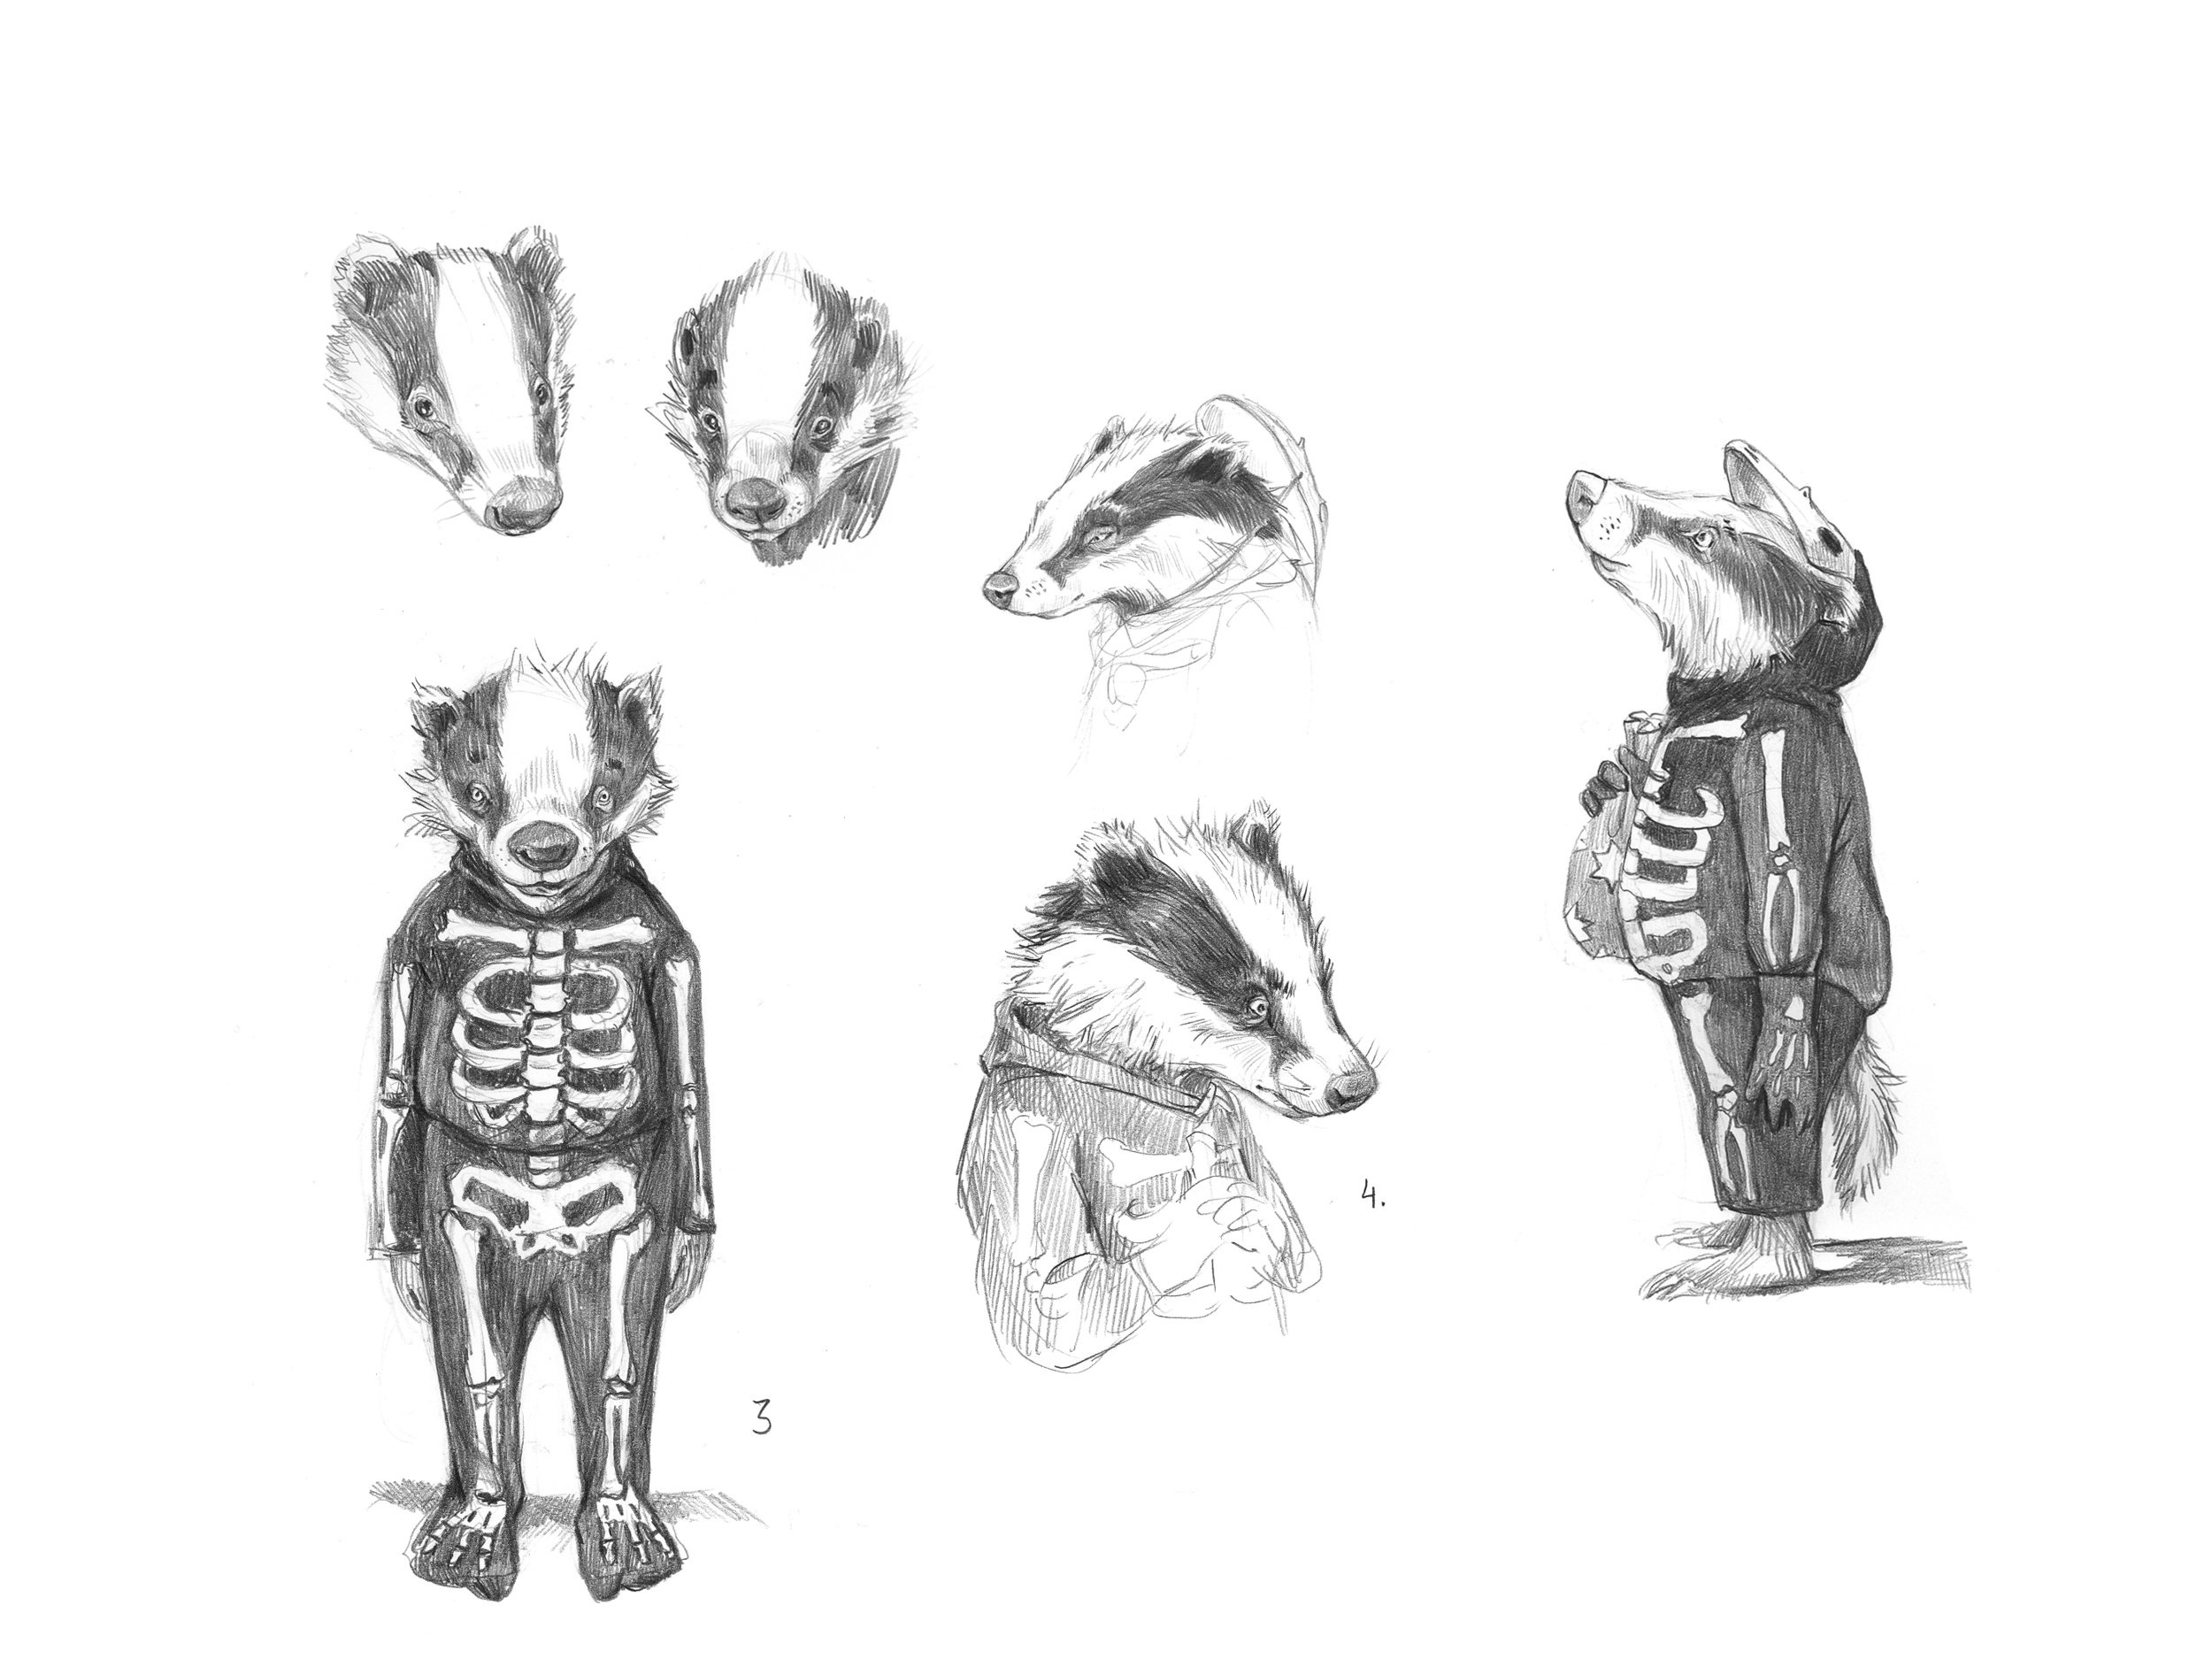 Badger's son